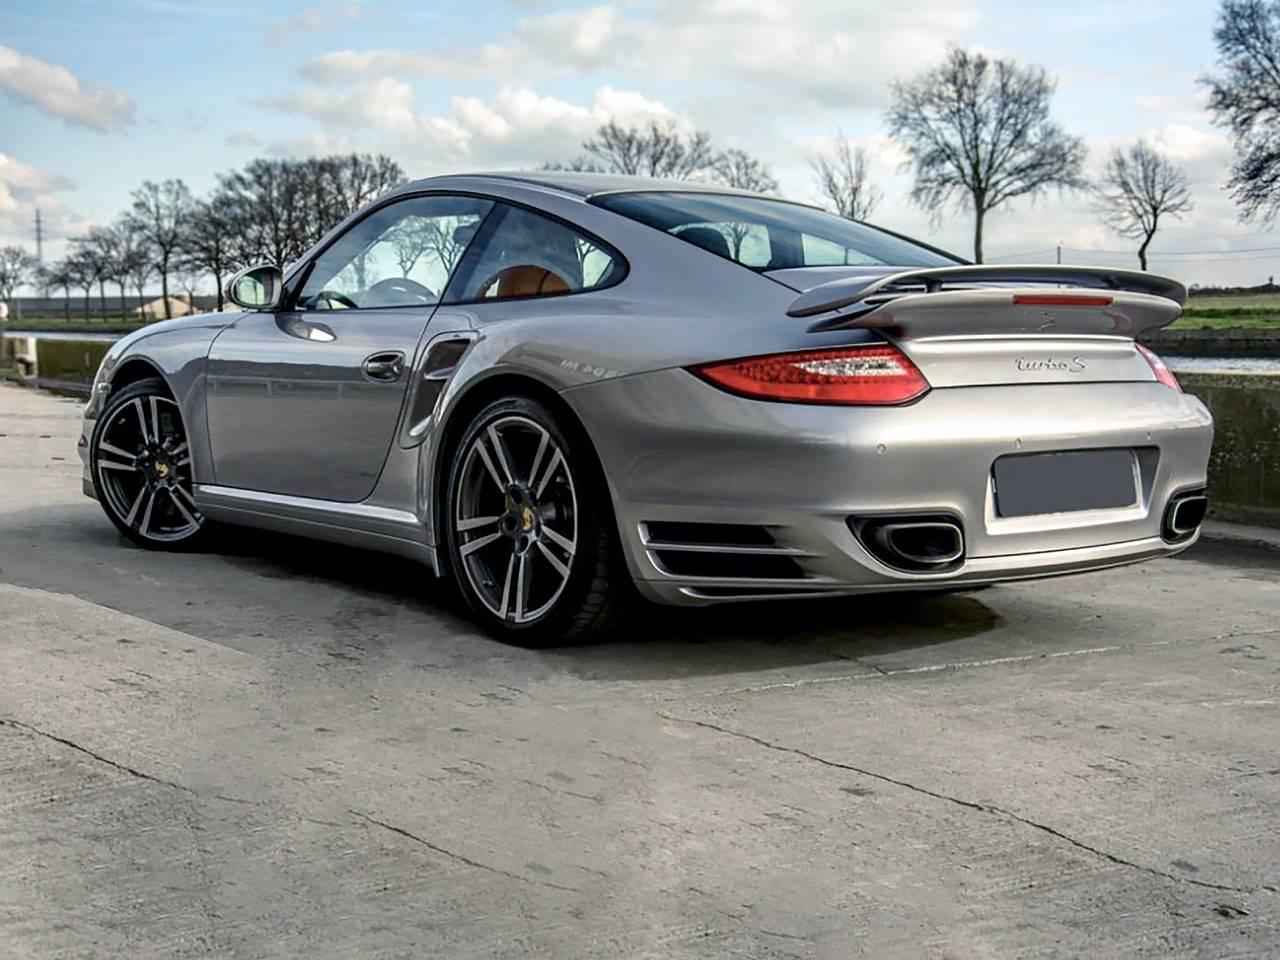 Porsche-911-Turbo-S-MKII-1